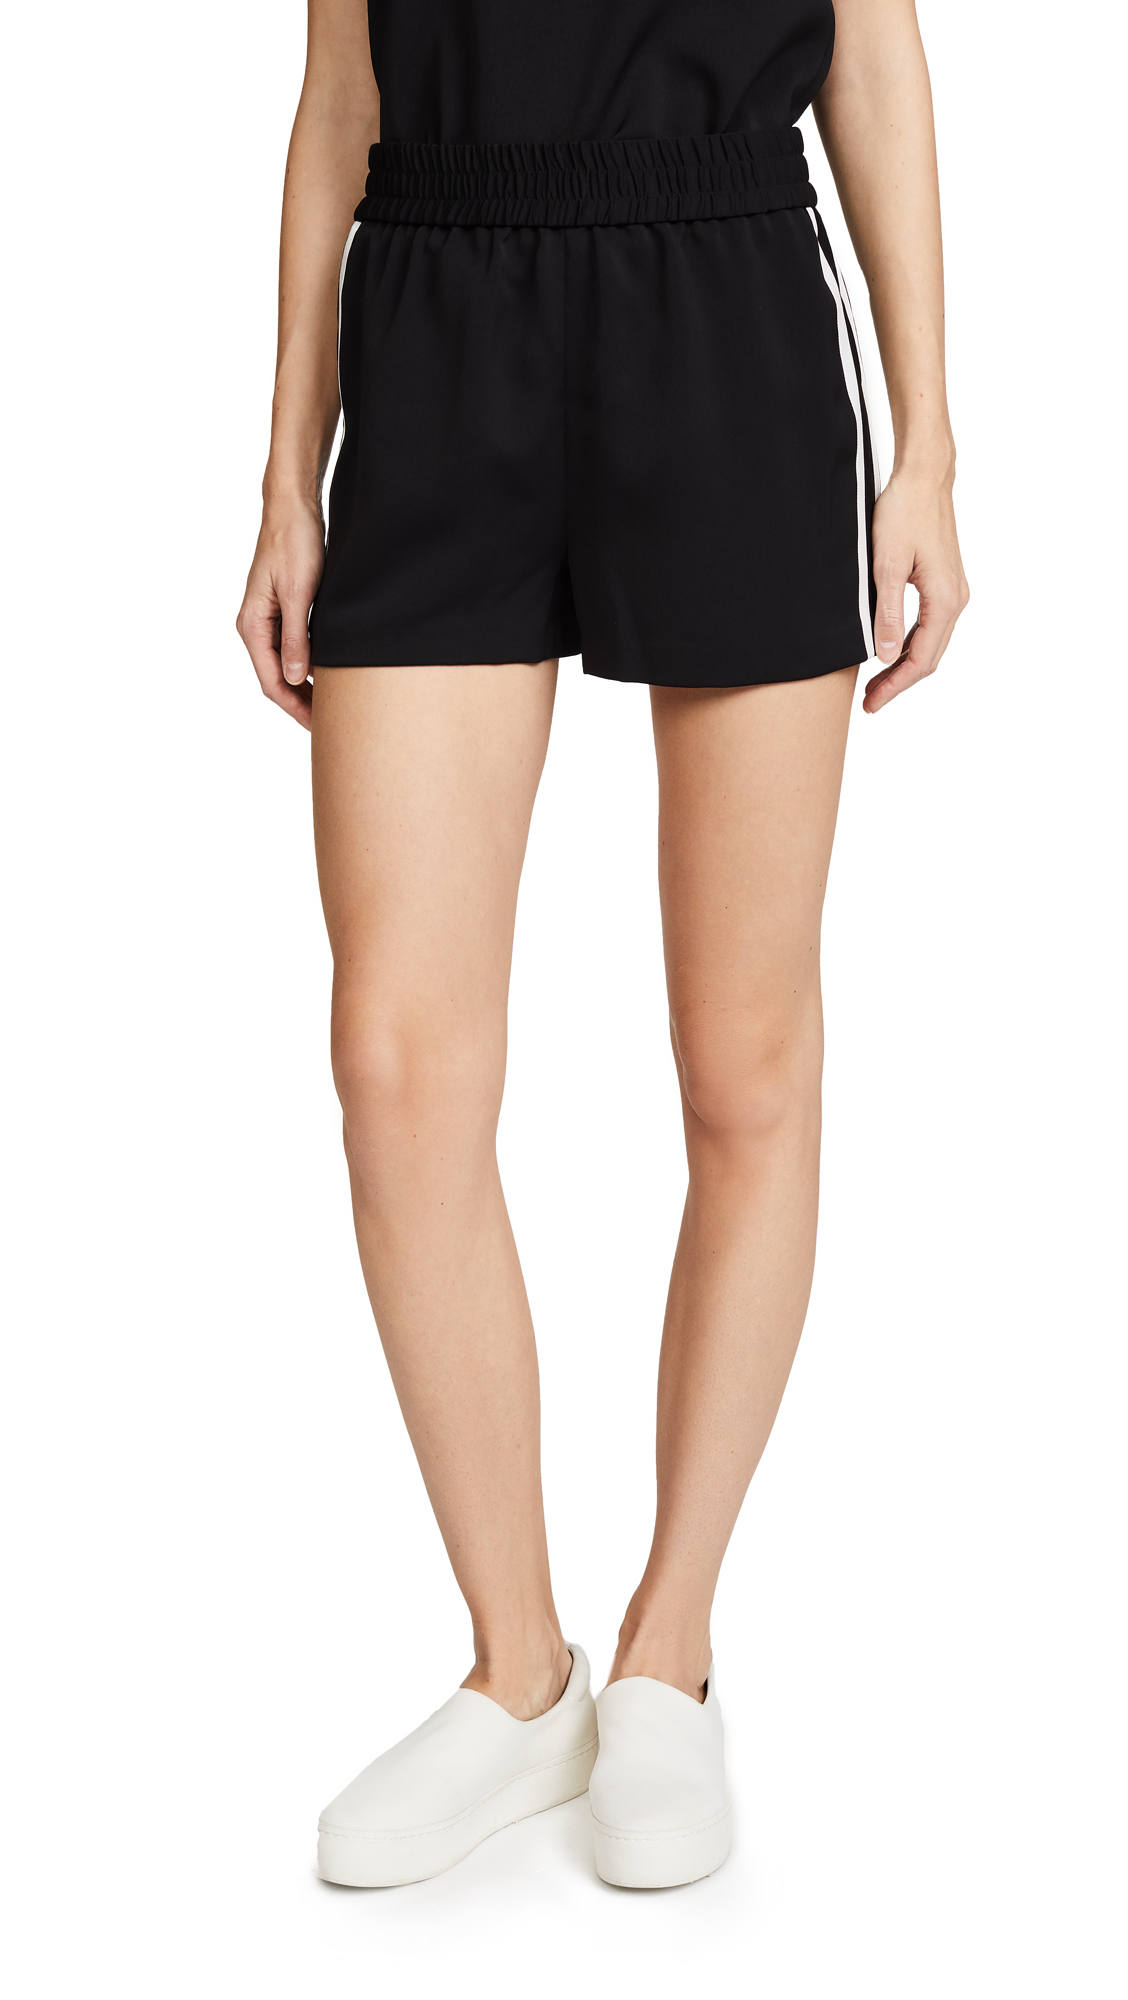 alice + olivia Ludlow Side Trim Shorts - Black/White